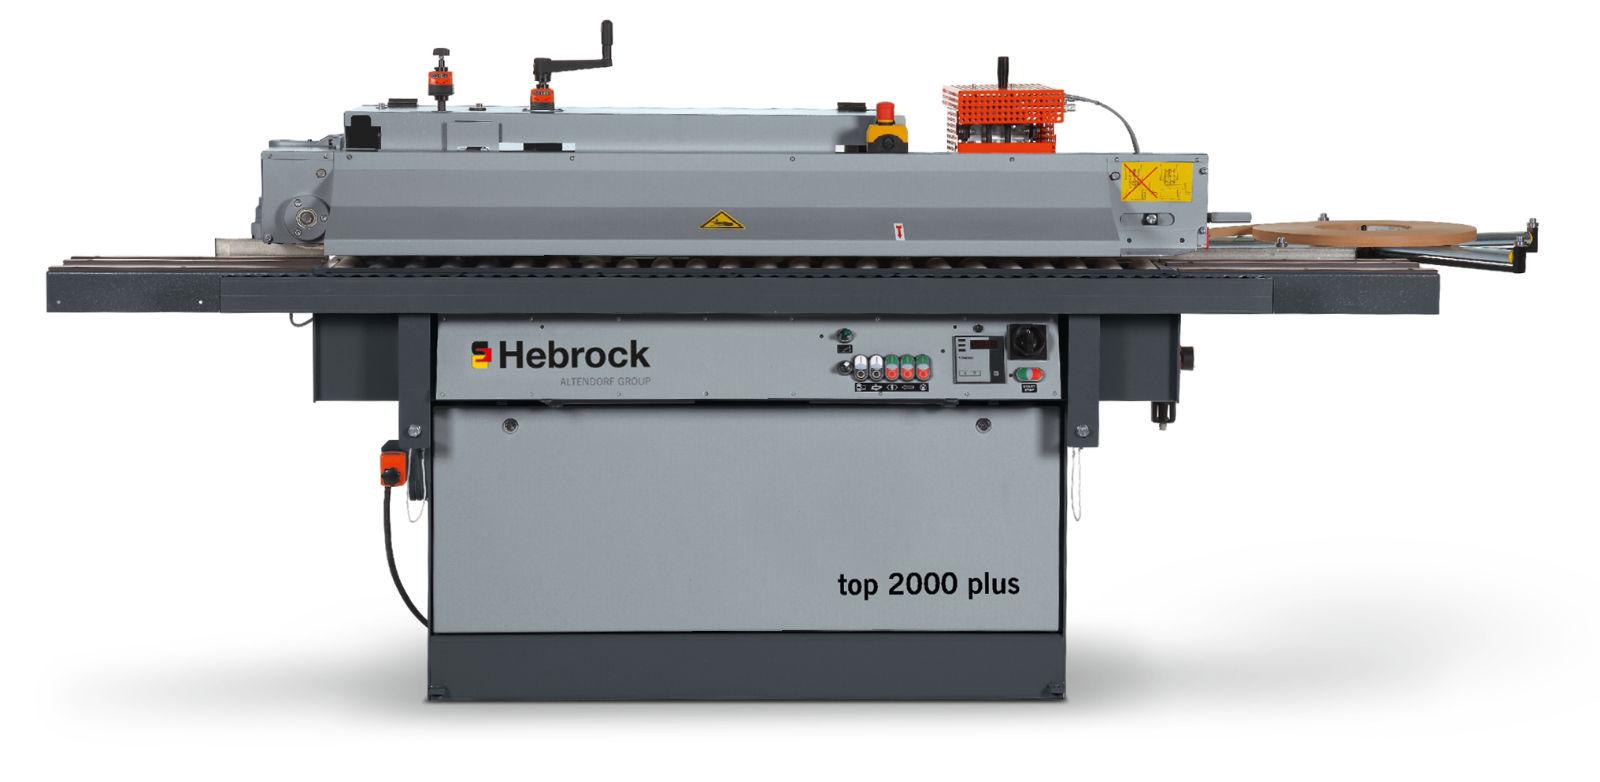 Hebrock Top 2000 Plus edgebander photo